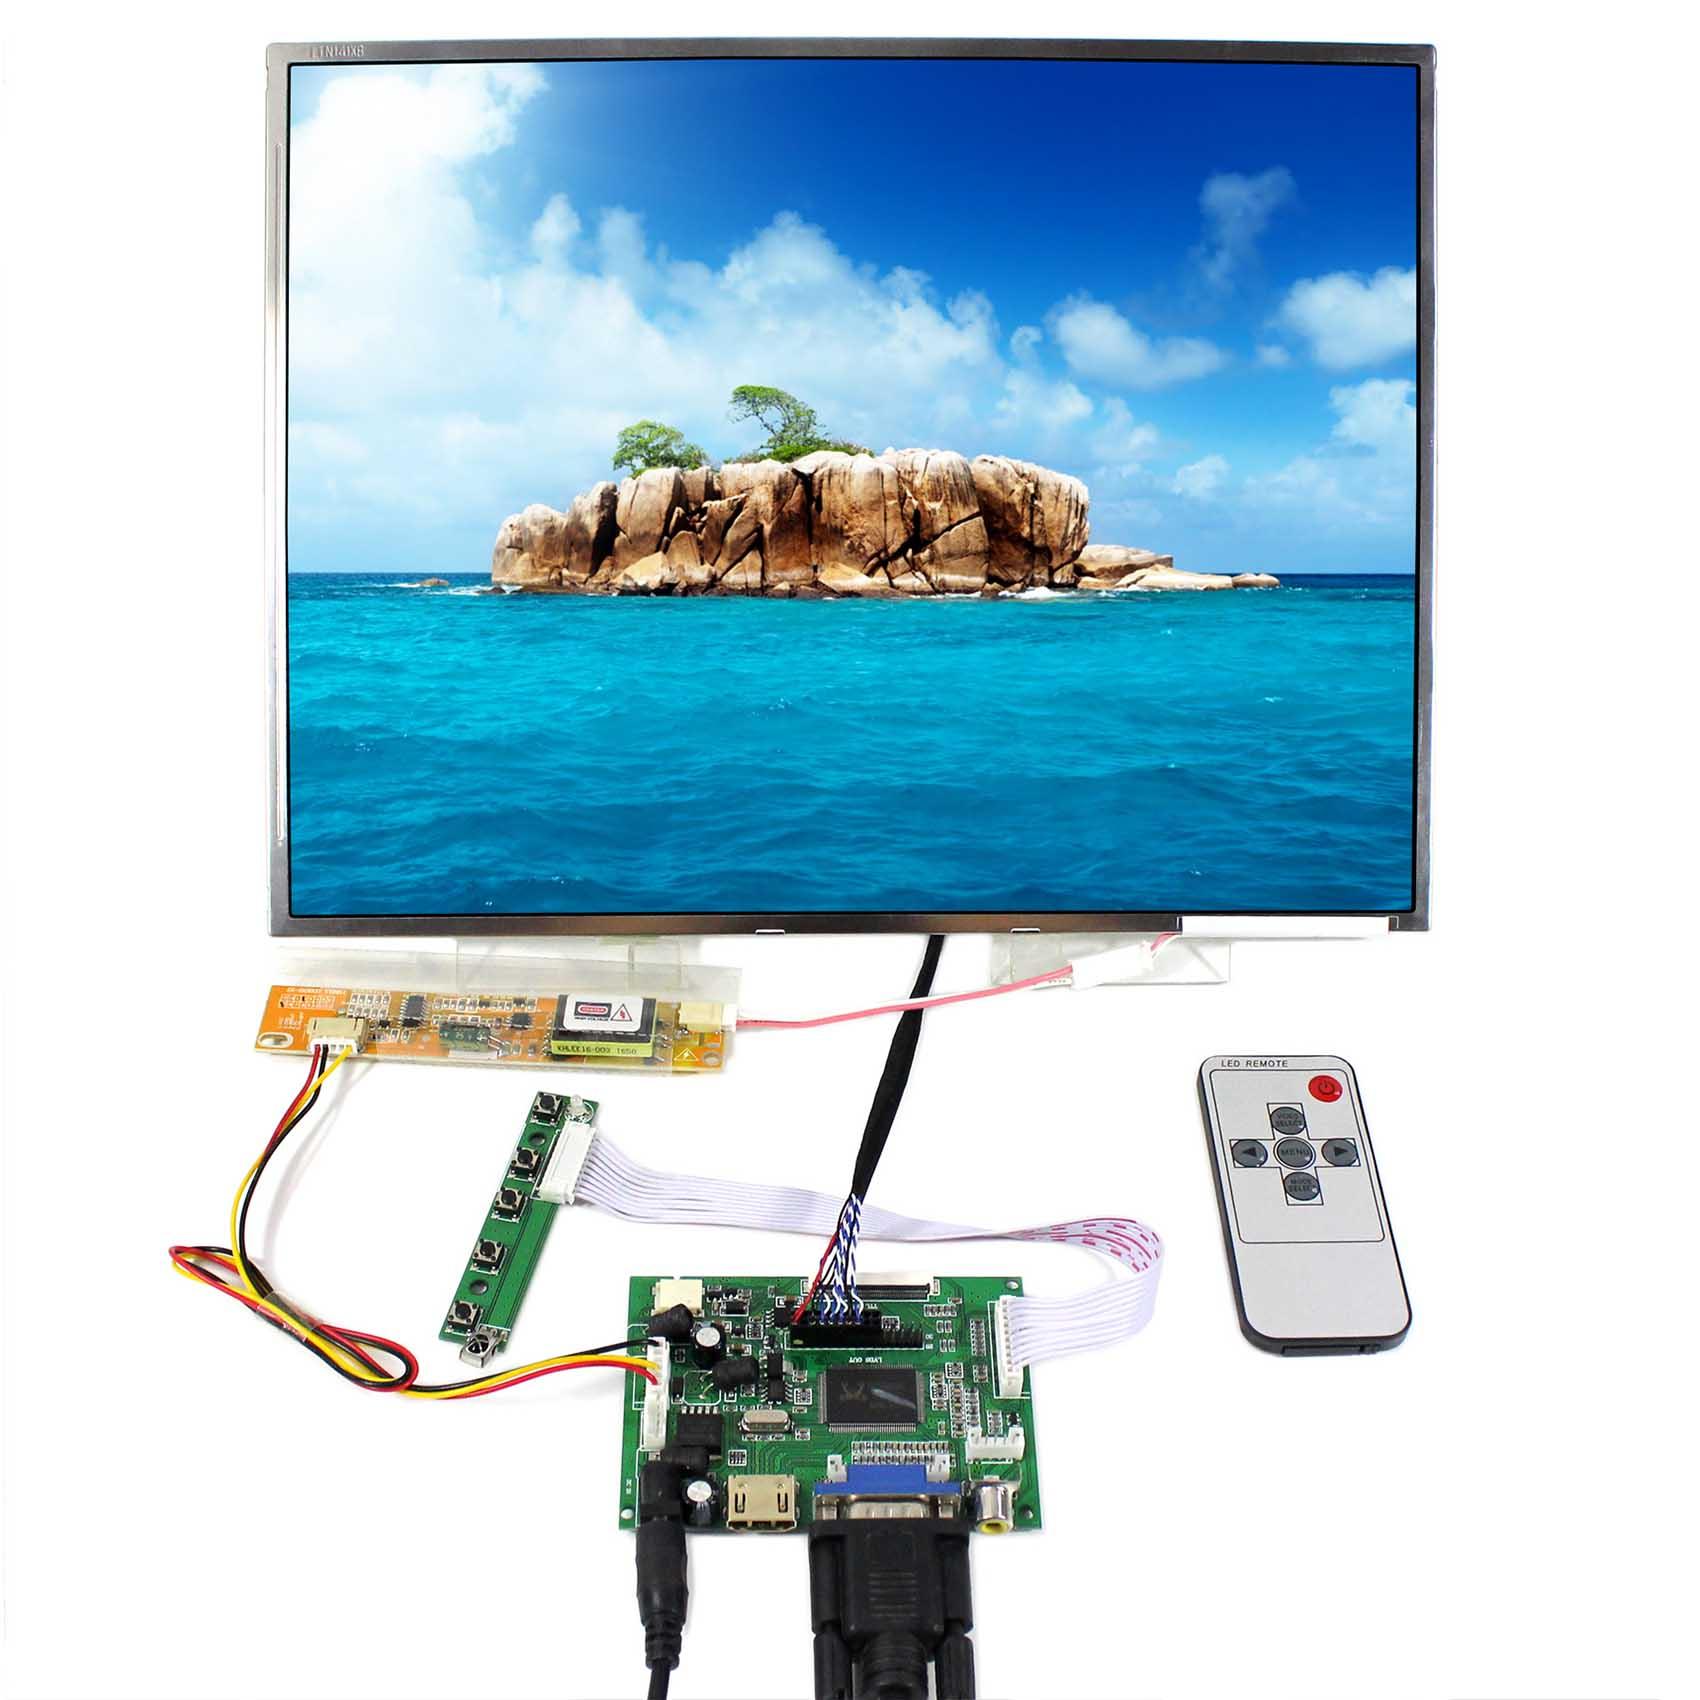 HDMI+VGA+2AV LCD Controller Board VS-TY2662-V1 With 14.1inch LTN141XF LTN141X6 LP141XA 1024x768 LCD Screen цена и фото